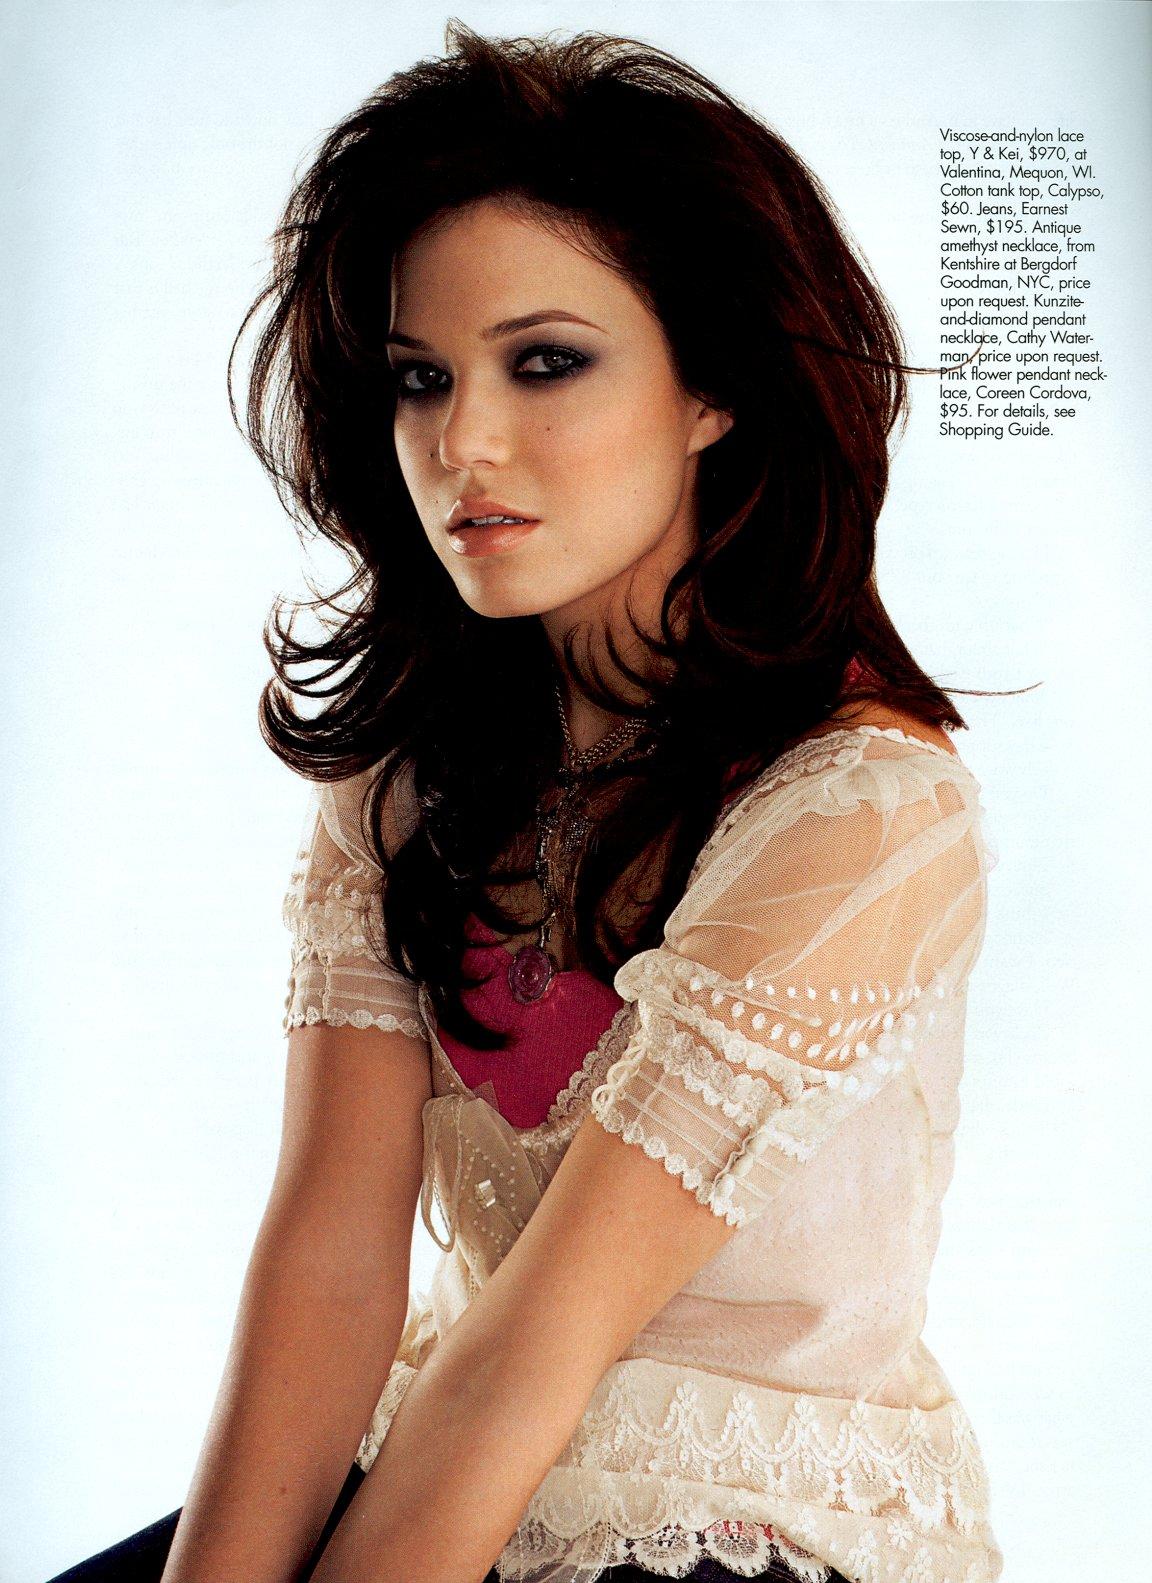 http://4.bp.blogspot.com/_GCAuqodmOE4/TRJnPUVVF9I/AAAAAAAAF6g/5xoPQ2PiYzo/s1600/Sexiest+Mandy+Moore++%252810%2529.jpg